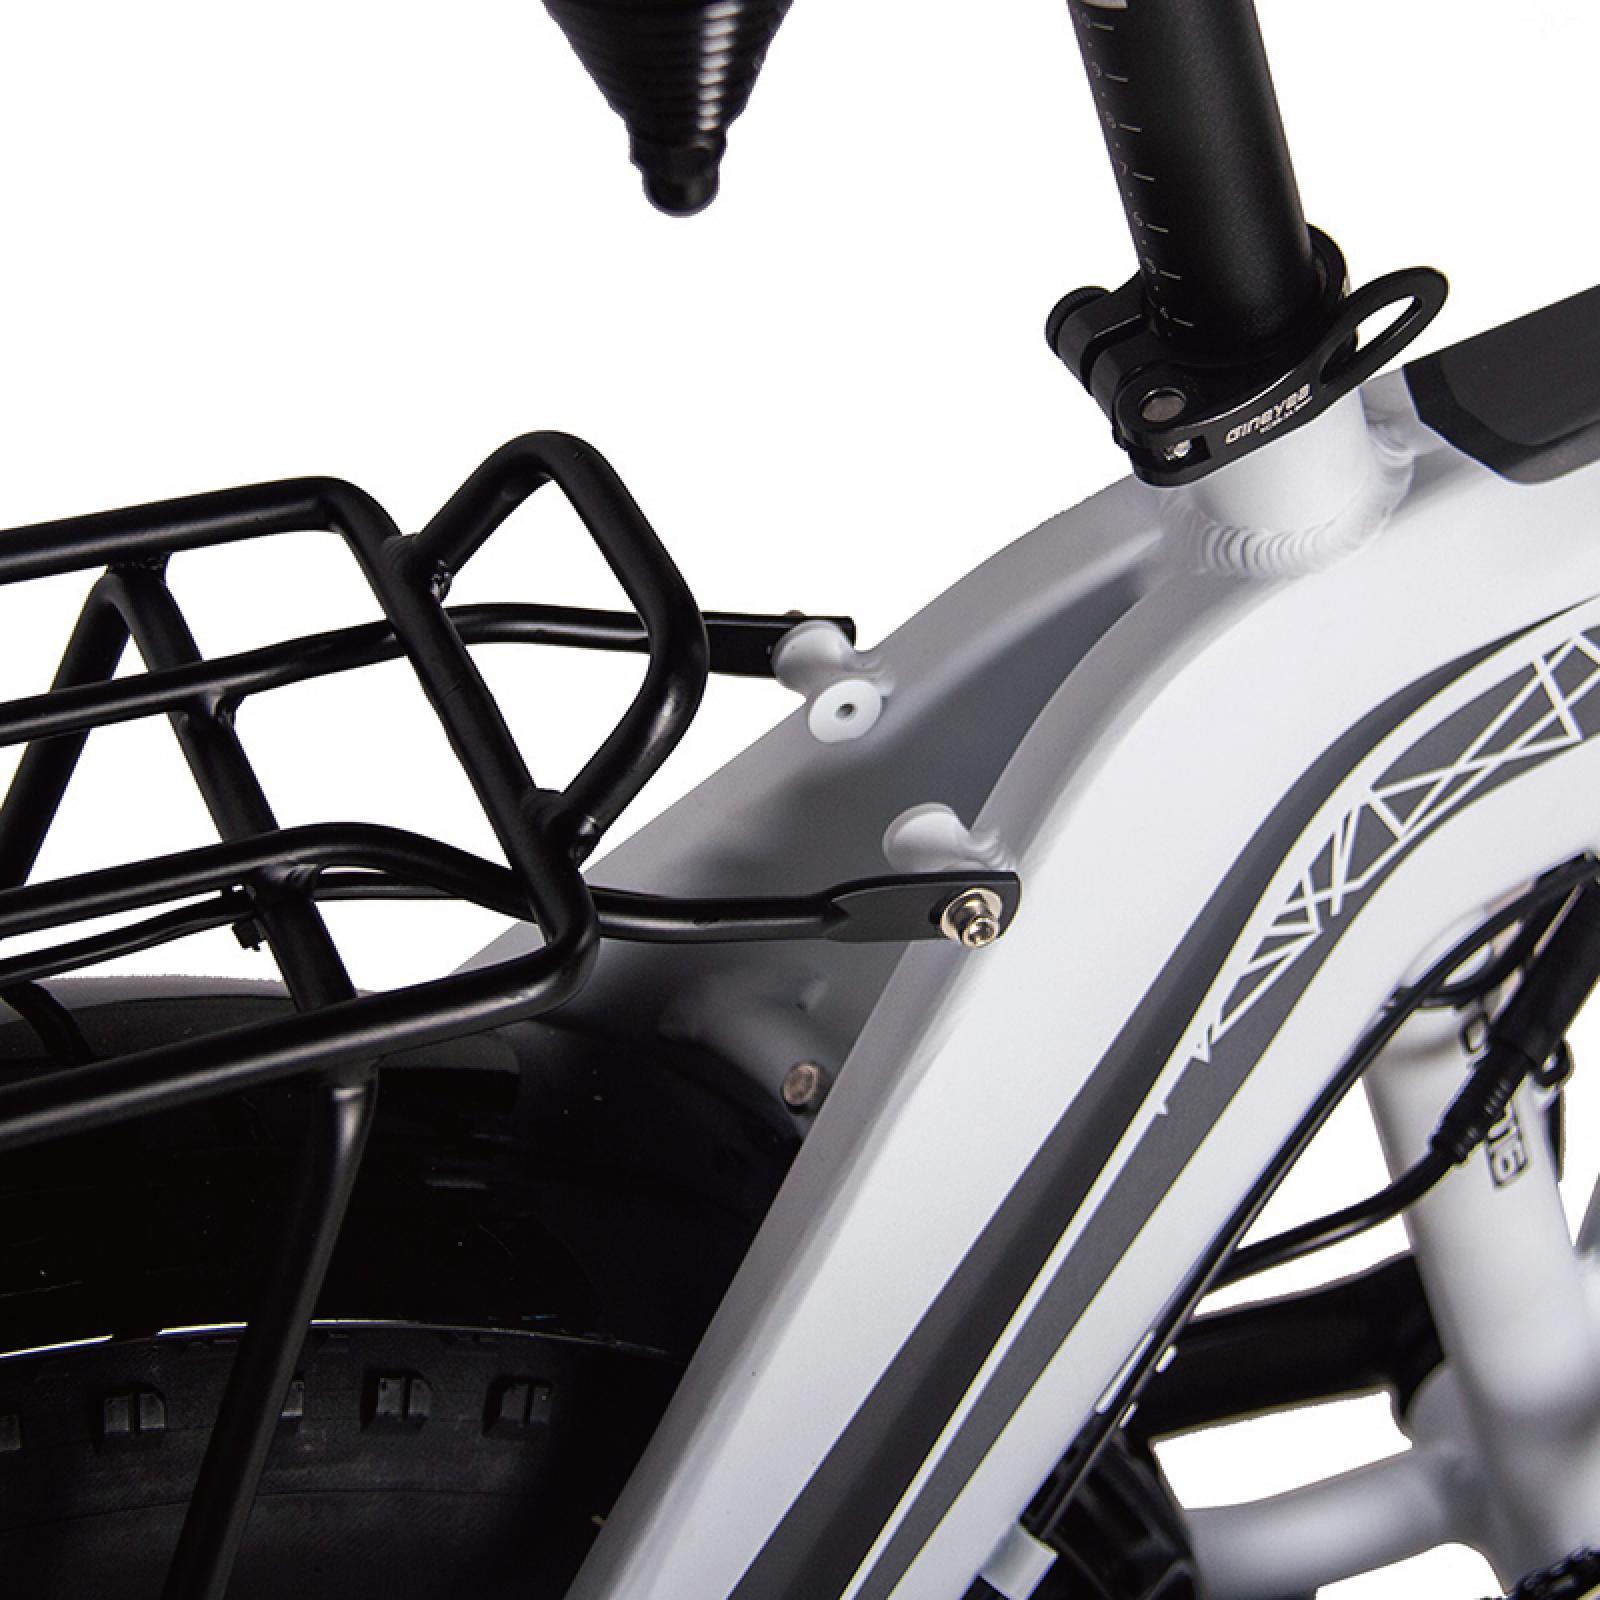 RICHBIT Smart EV TOP016 公道仕様 電動バイク 電動スクーター モペット 折り畳み式 スマートeバイク ハイブリッドサンドバイク スノーバイク 4色 送料無料